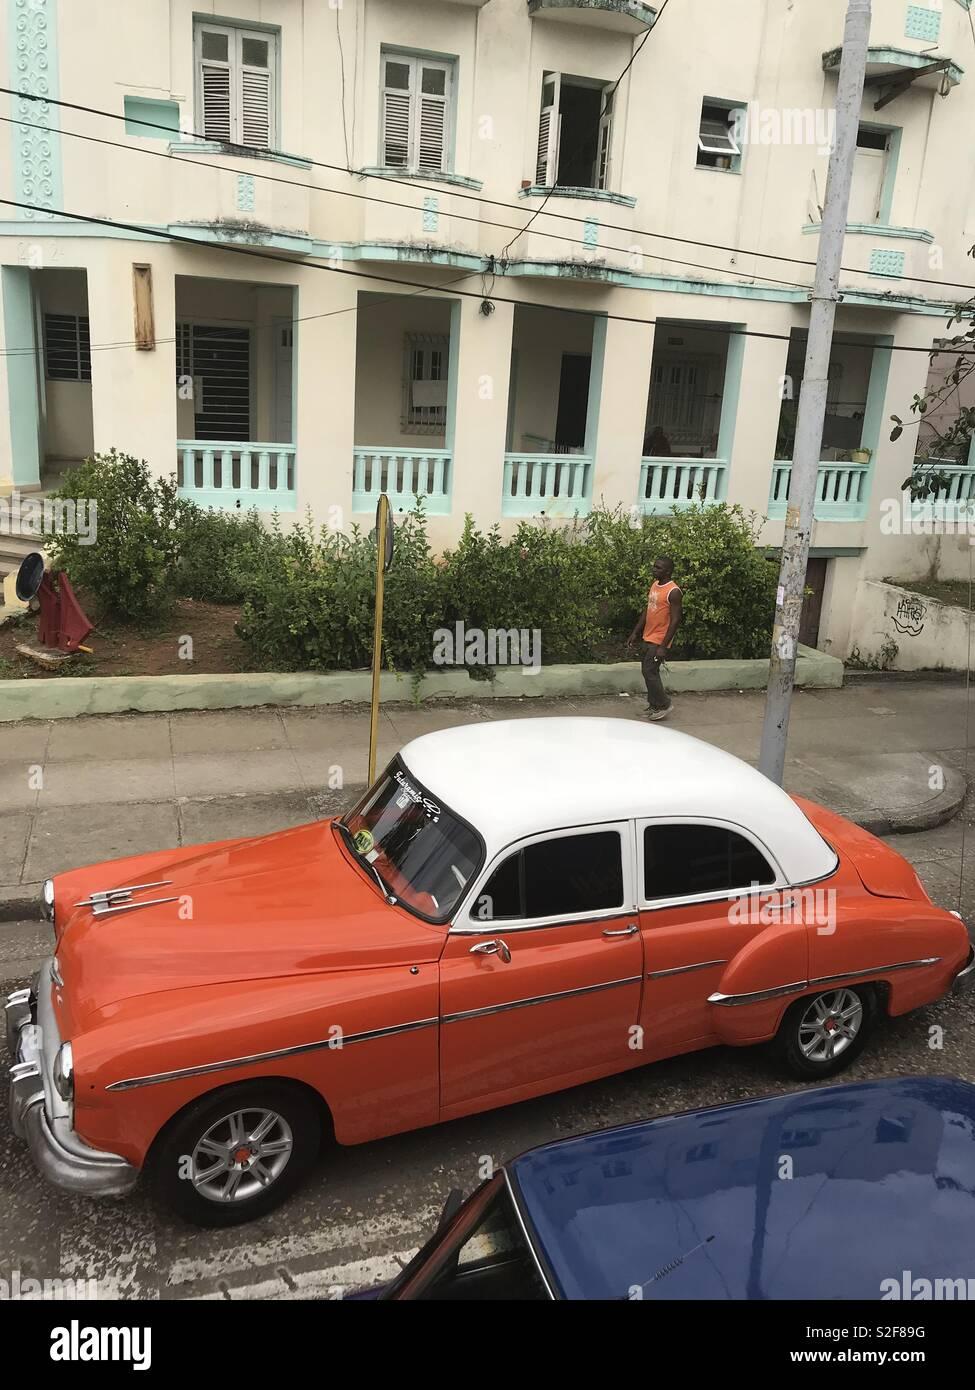 Outstanding orange and white classic car in Havana Cuba - Stock Image